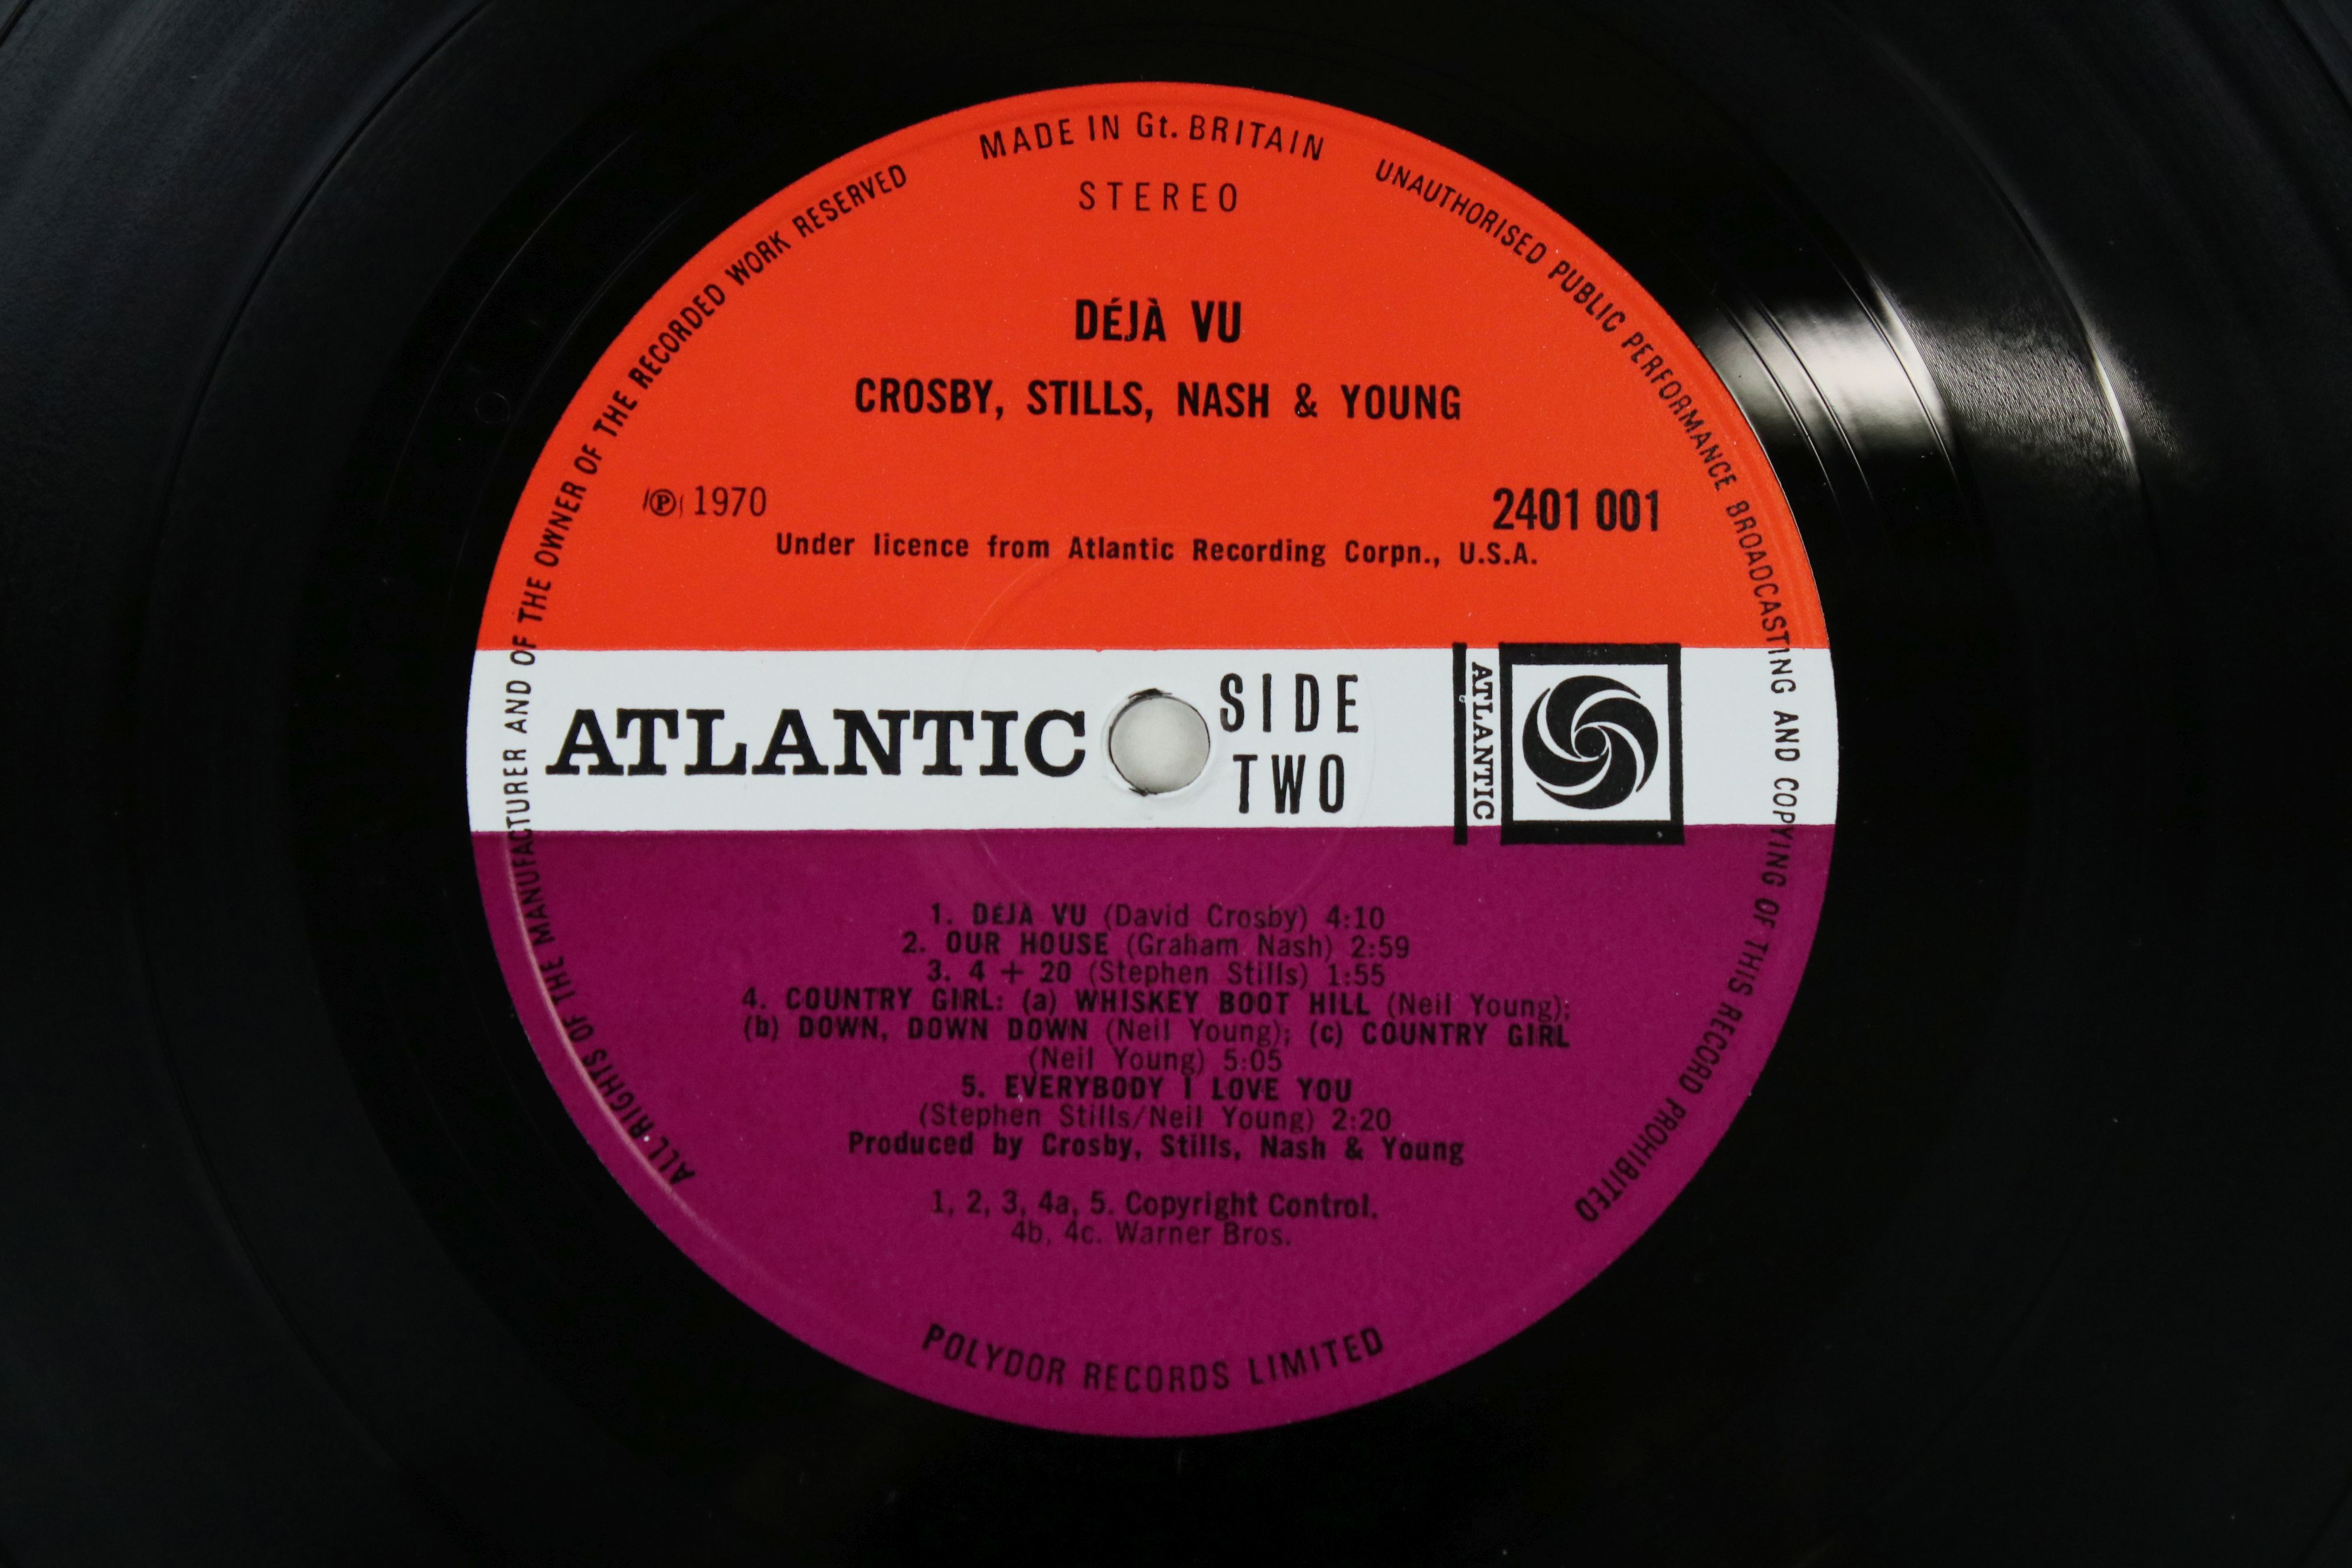 Vinyl - Crosby, Stills, Nash & Young Deja Vu (Atlantic 2401 001) red and plum Atlantic label with - Image 3 of 4